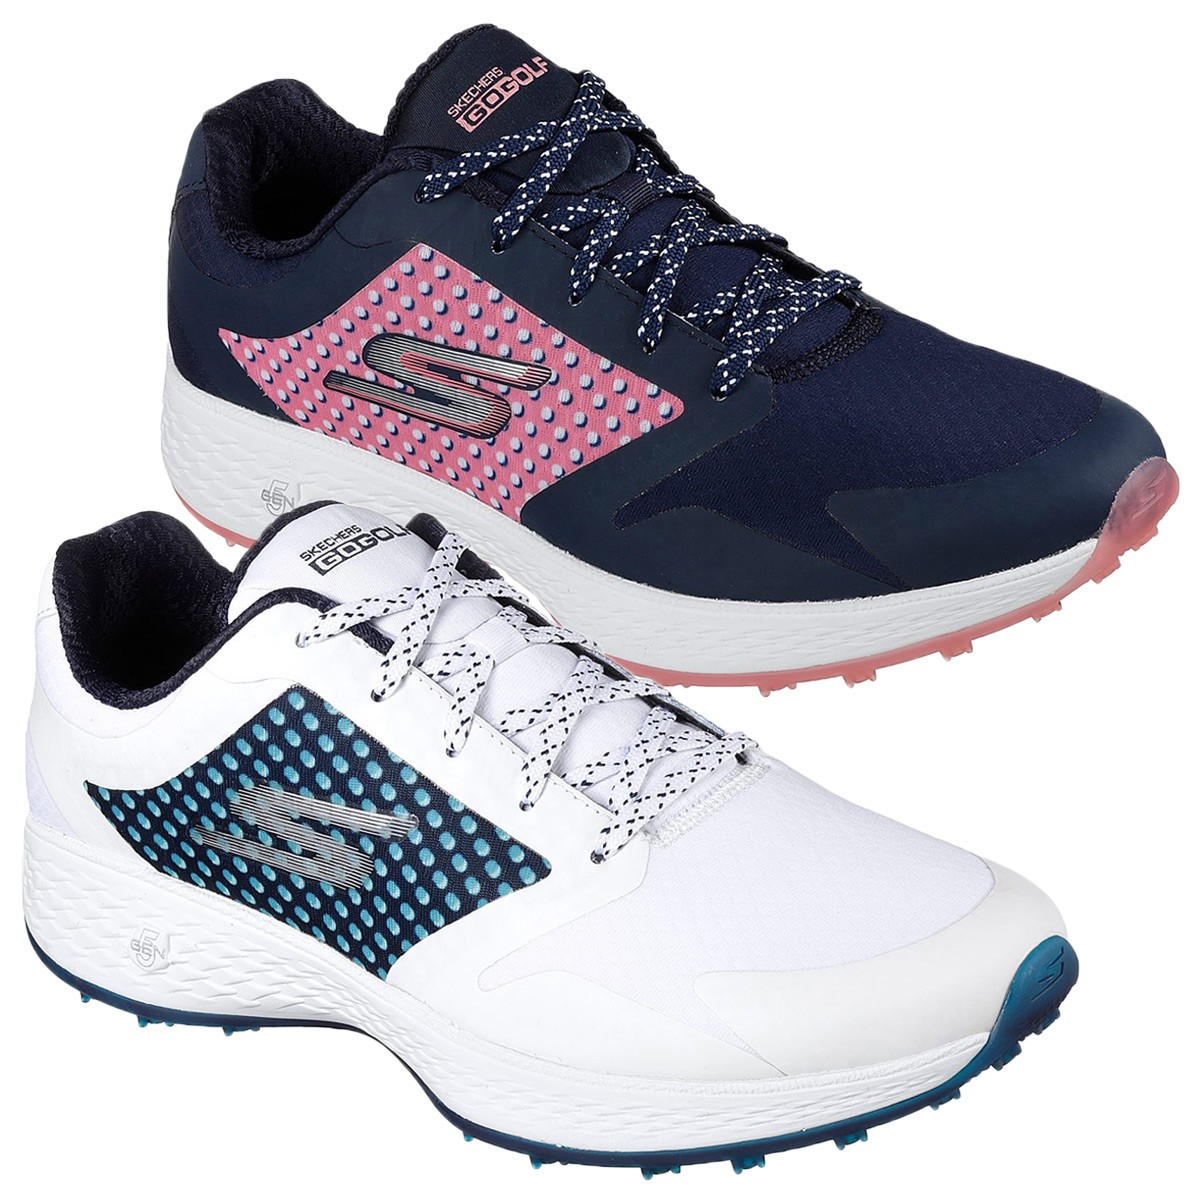 81c5ba60dc62 Skechers Golf Womens Go Eagle Lead Spikeless Waterproof Golf Shoes